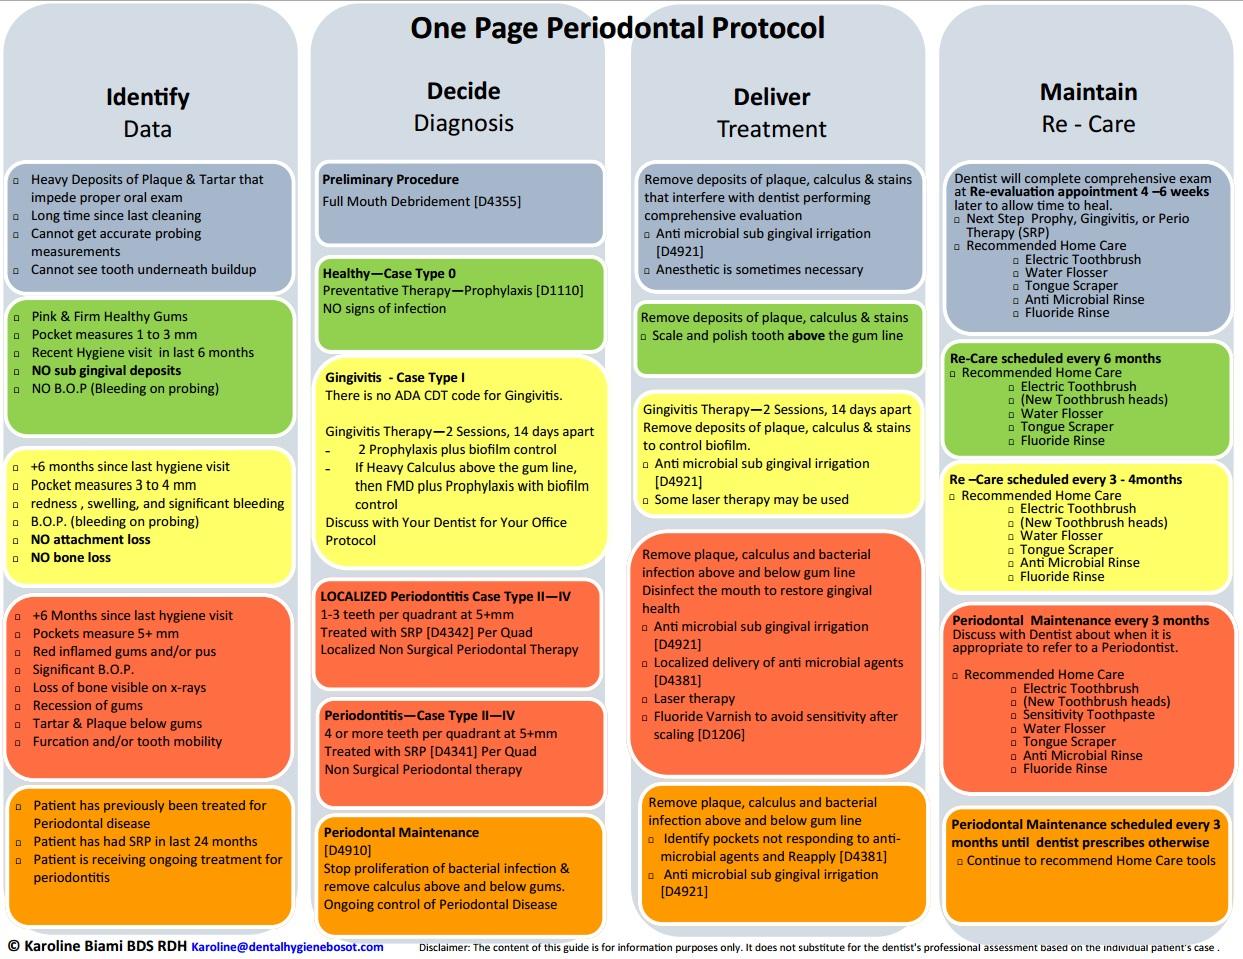 One Page Periodontal Protocol